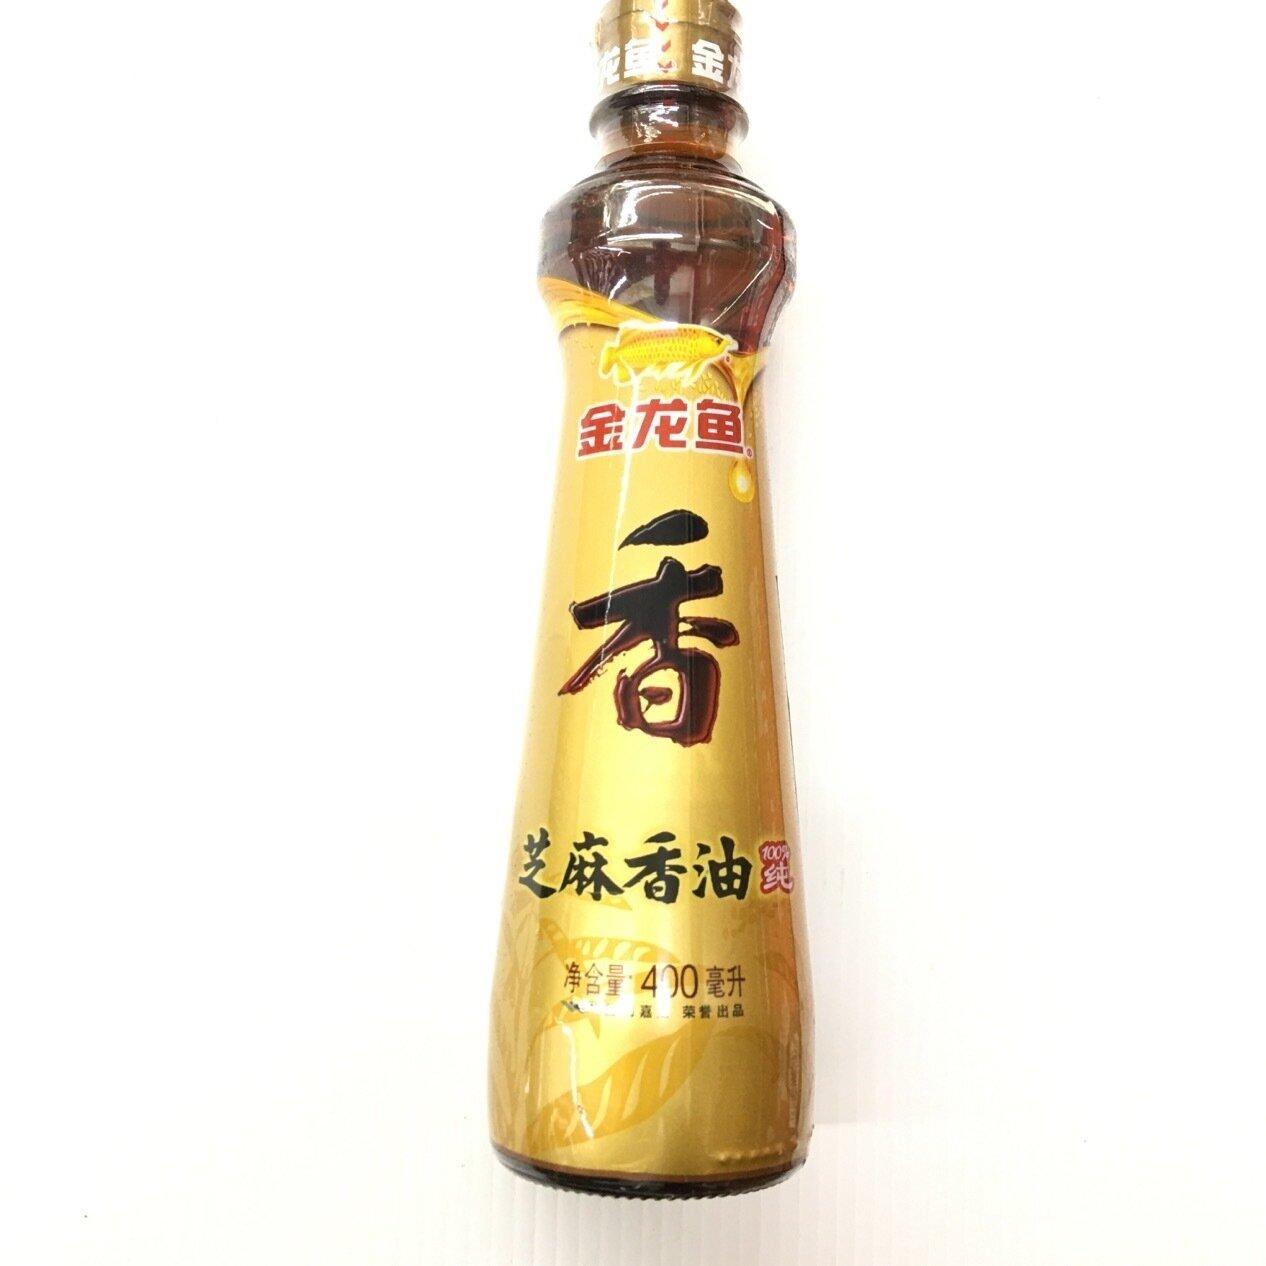 GROC【杂货】金龙鱼 芝麻香油 400ml